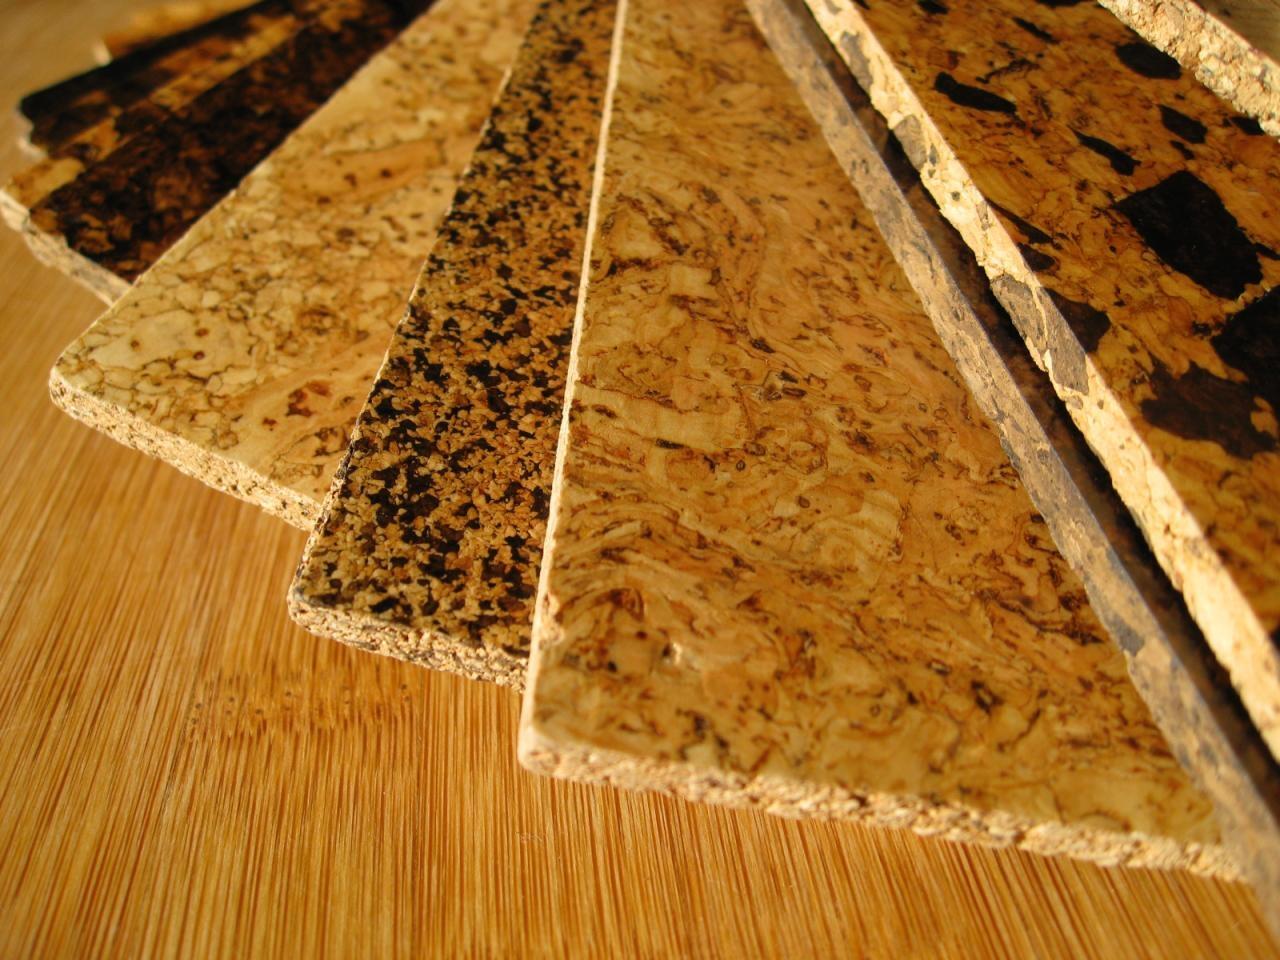 Best Floor Covering For Basement Bathroom1280 X 960